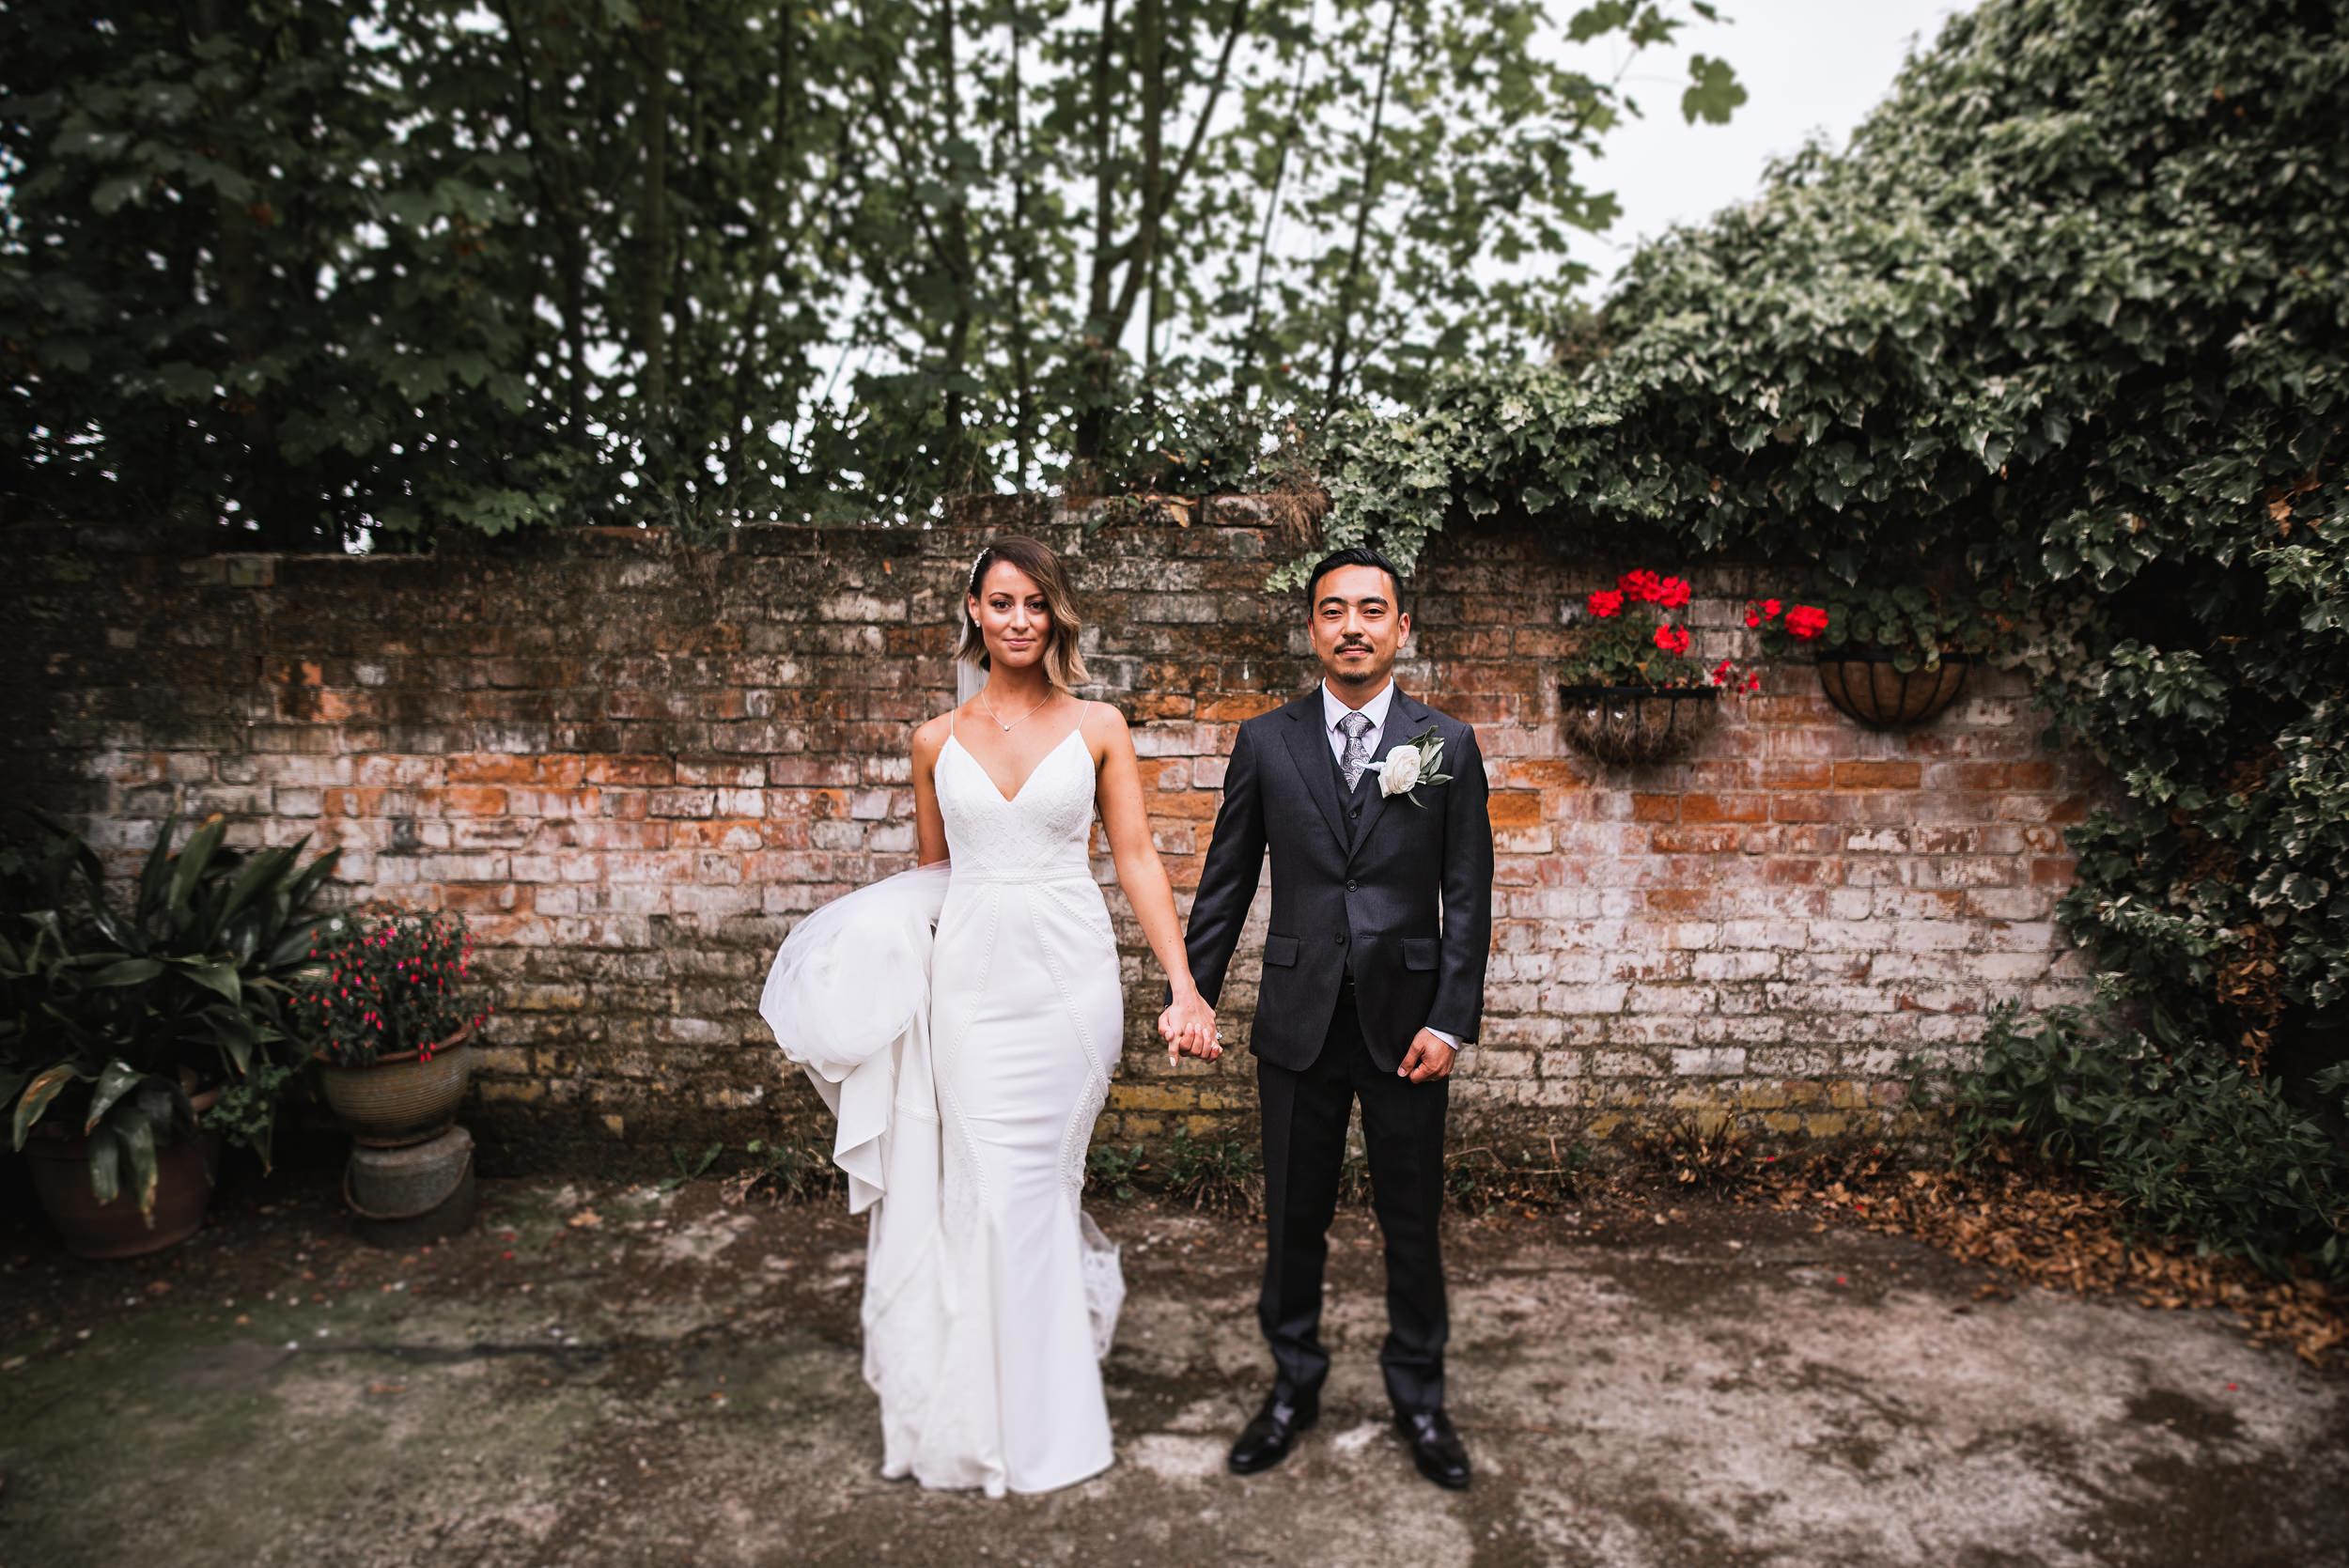 Joseph-OSullivan-CHCH-weddings14.jpg